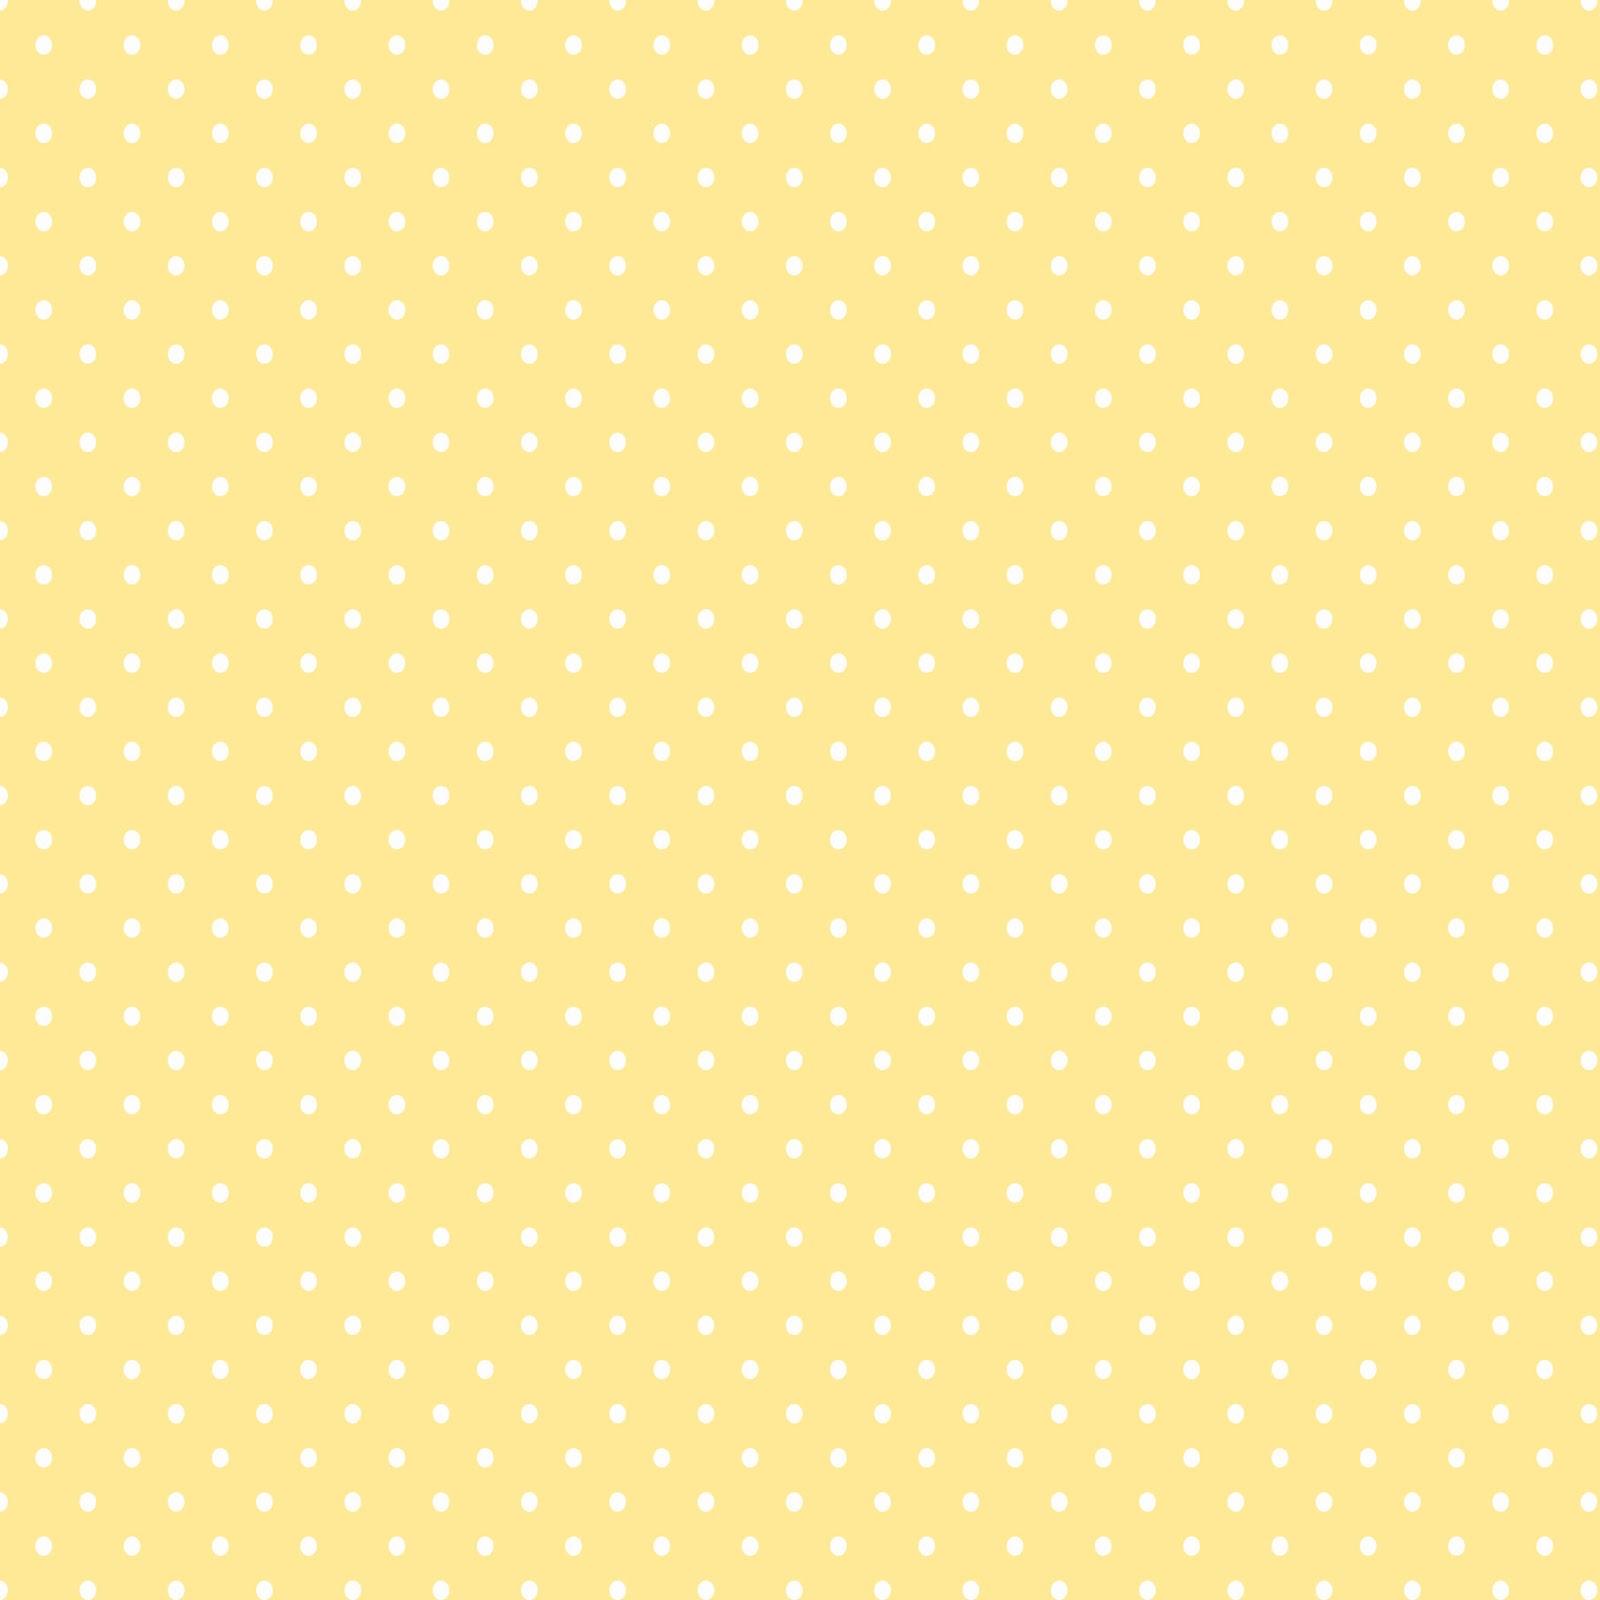 http://1.bp.blogspot.com/-ETDmehhxO9A/U09bLFyr9wI/AAAAAAAANyU/f6hMCURGVv0/s1600/free+digital+scrapbook+paper+-+yellow+with+white+polka+dots.jpg